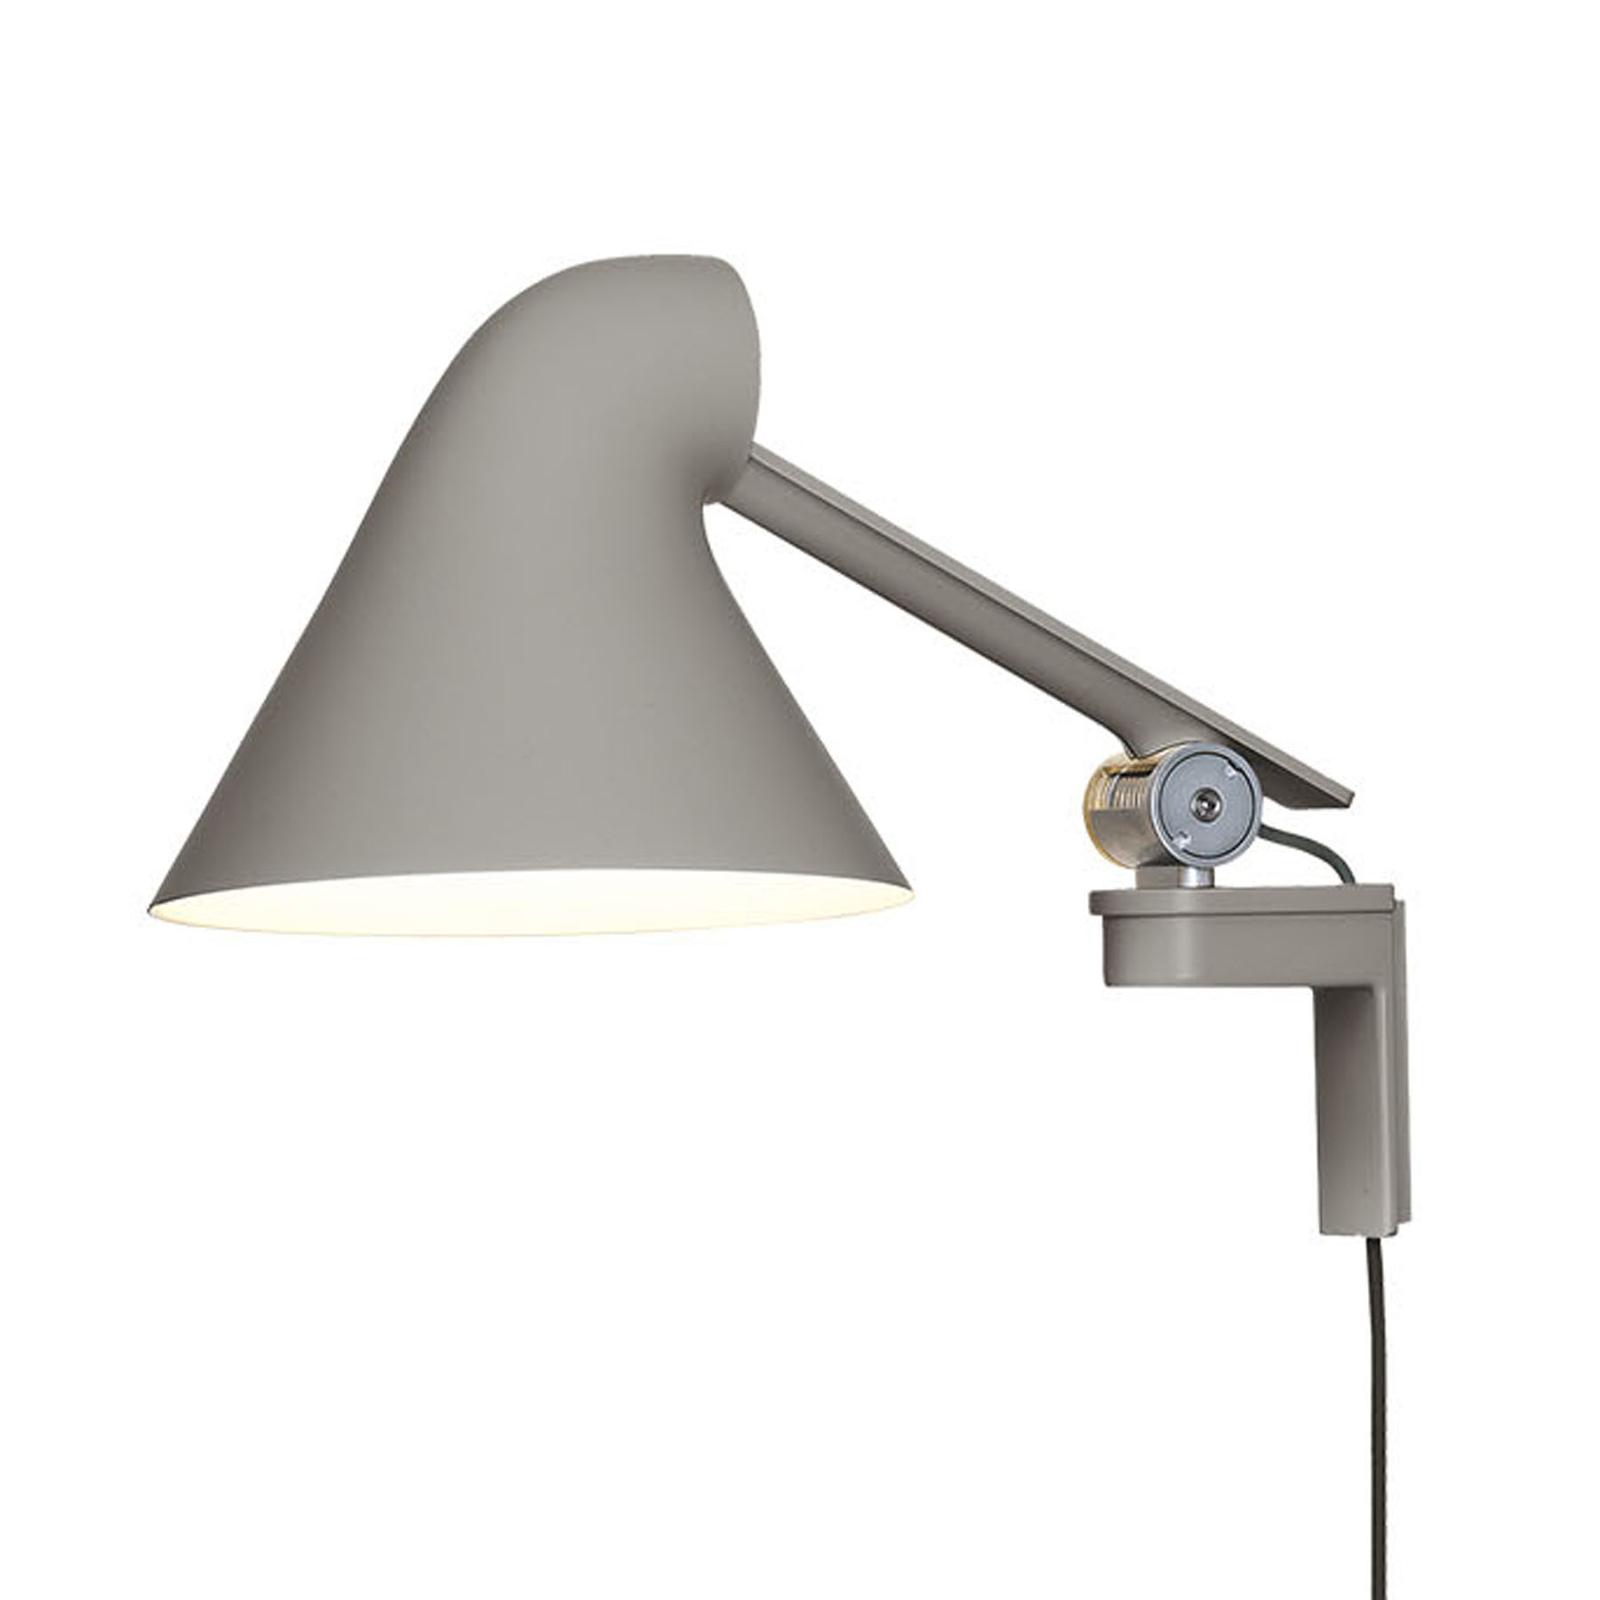 Louis Poulsen NJP LED wandlamp arm kort lichtgrijs